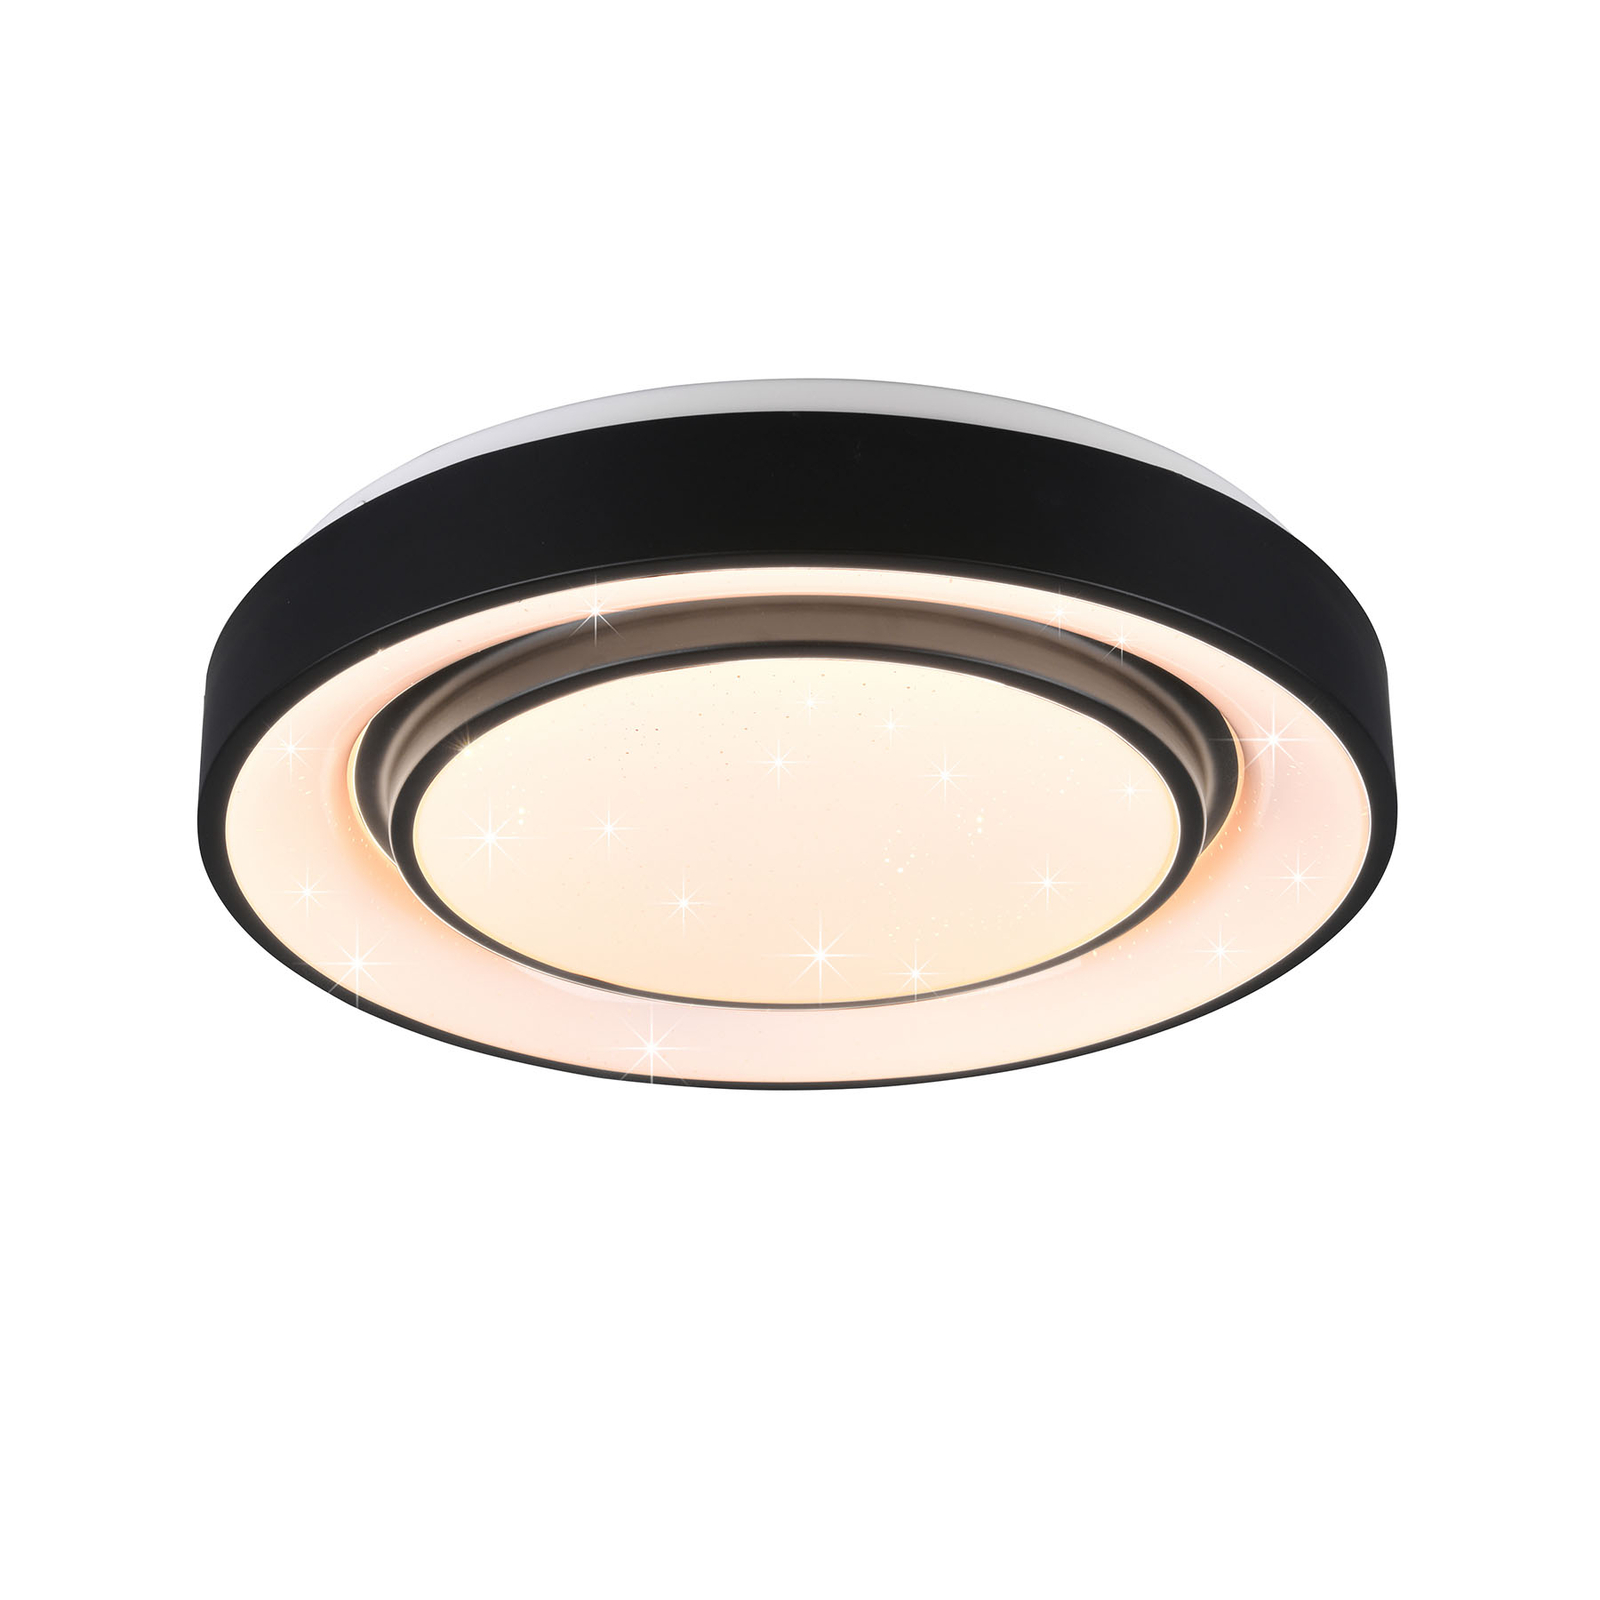 LED-taklampe Mona, WiZ, RGBW, dimbar